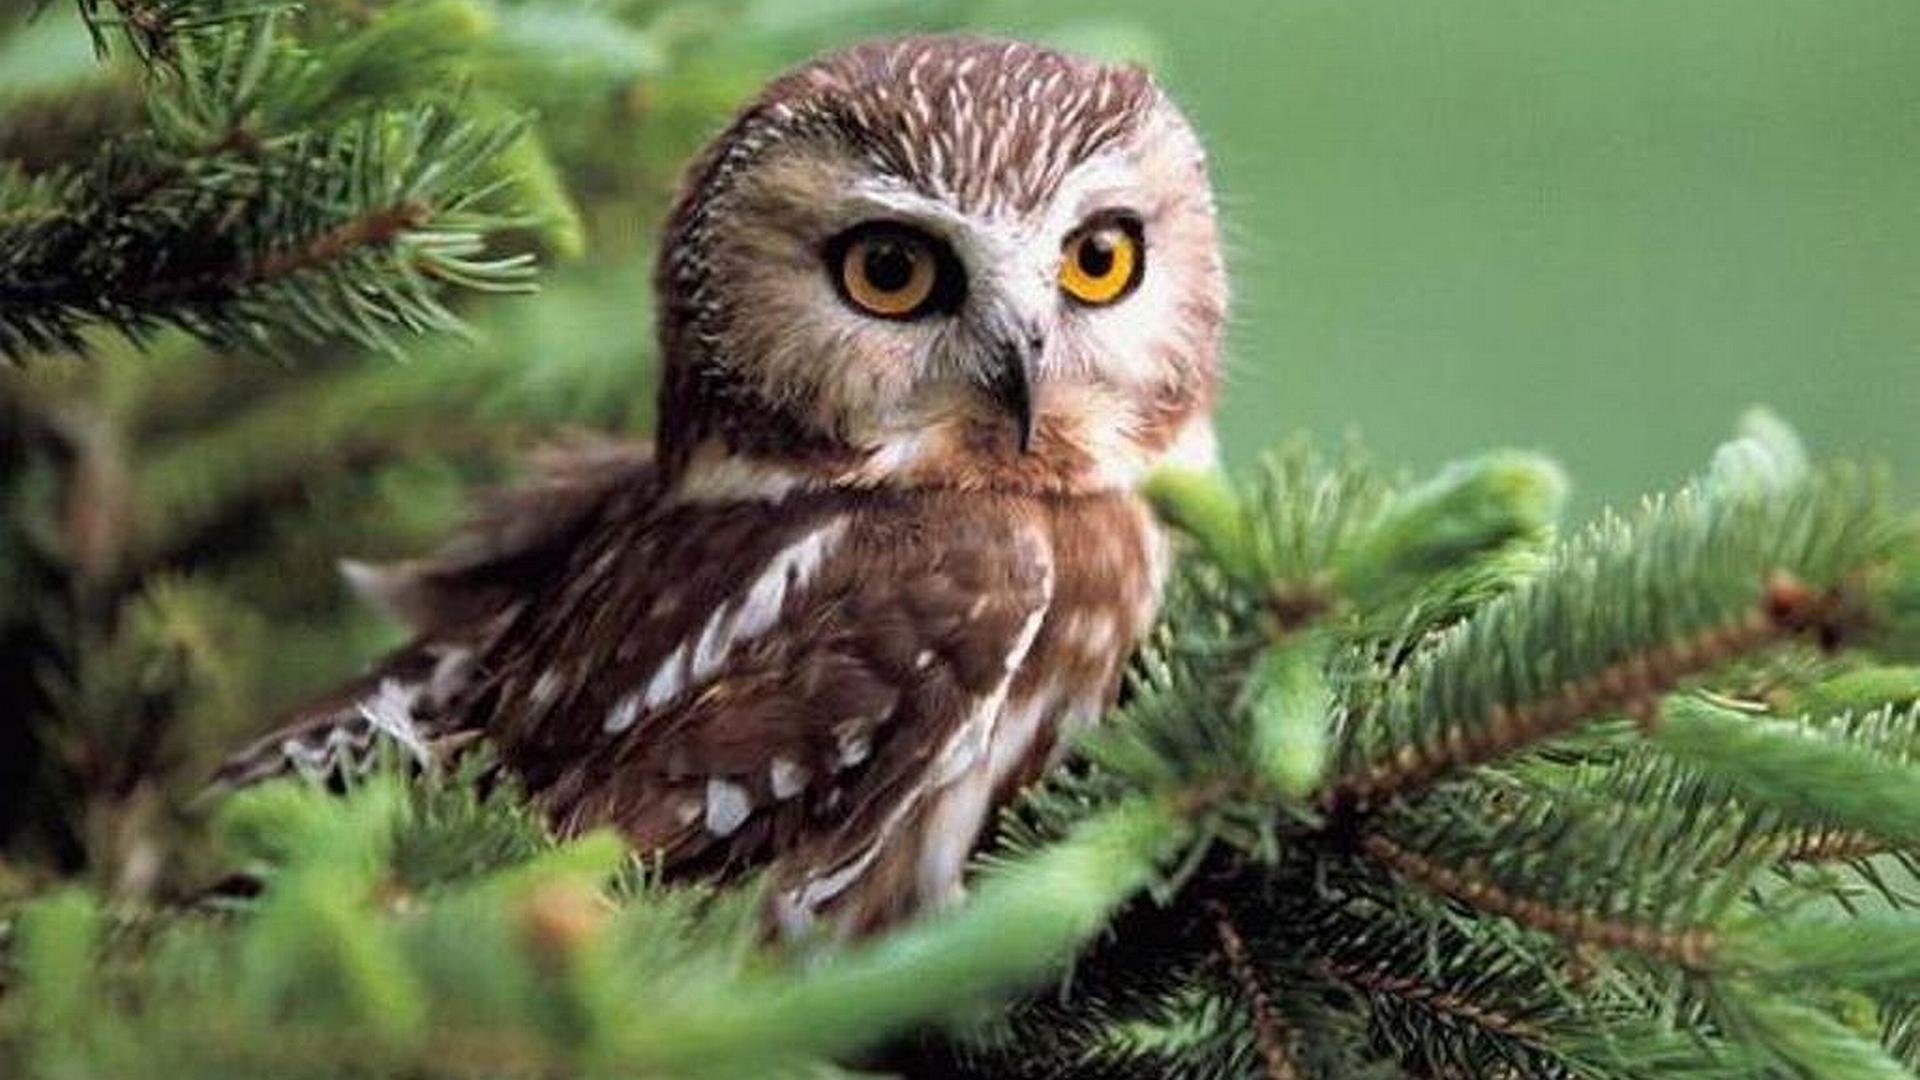 cute Owl Love Wallpaper : cute owl desktop wallpaper - HD Desktop Wallpapers 4k HD